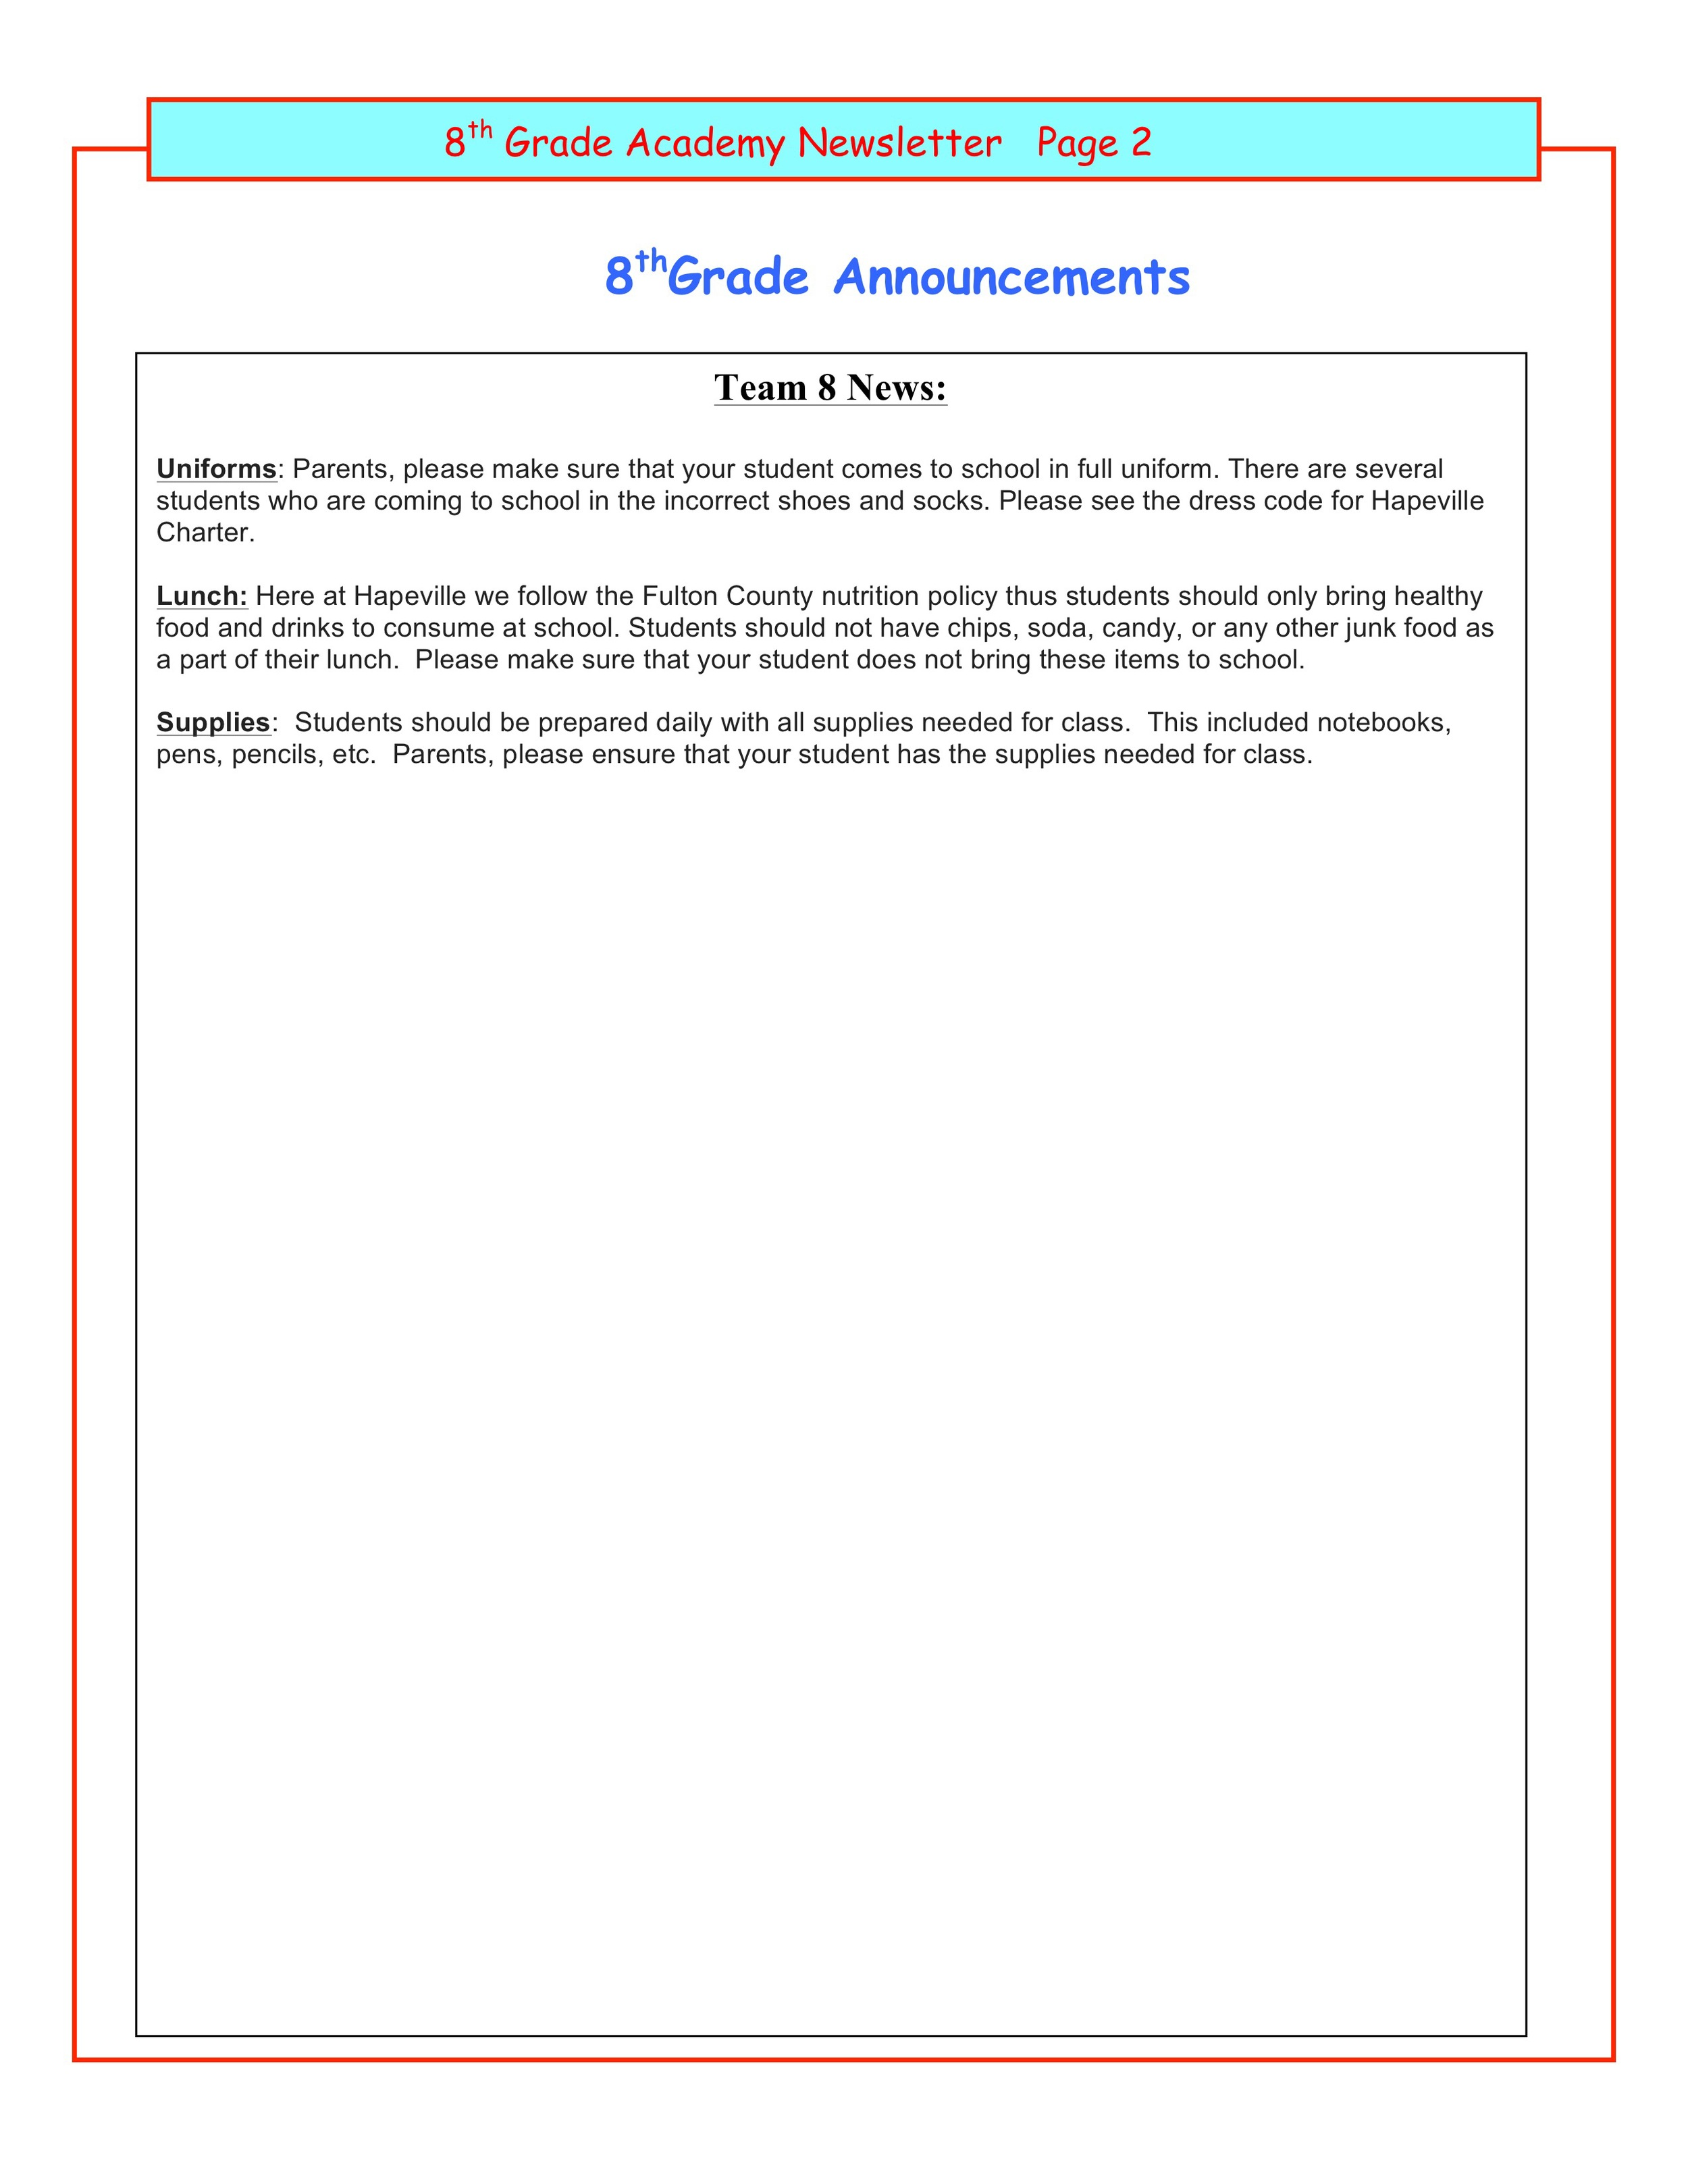 Newsletter Image8th grade October 27 2.jpeg